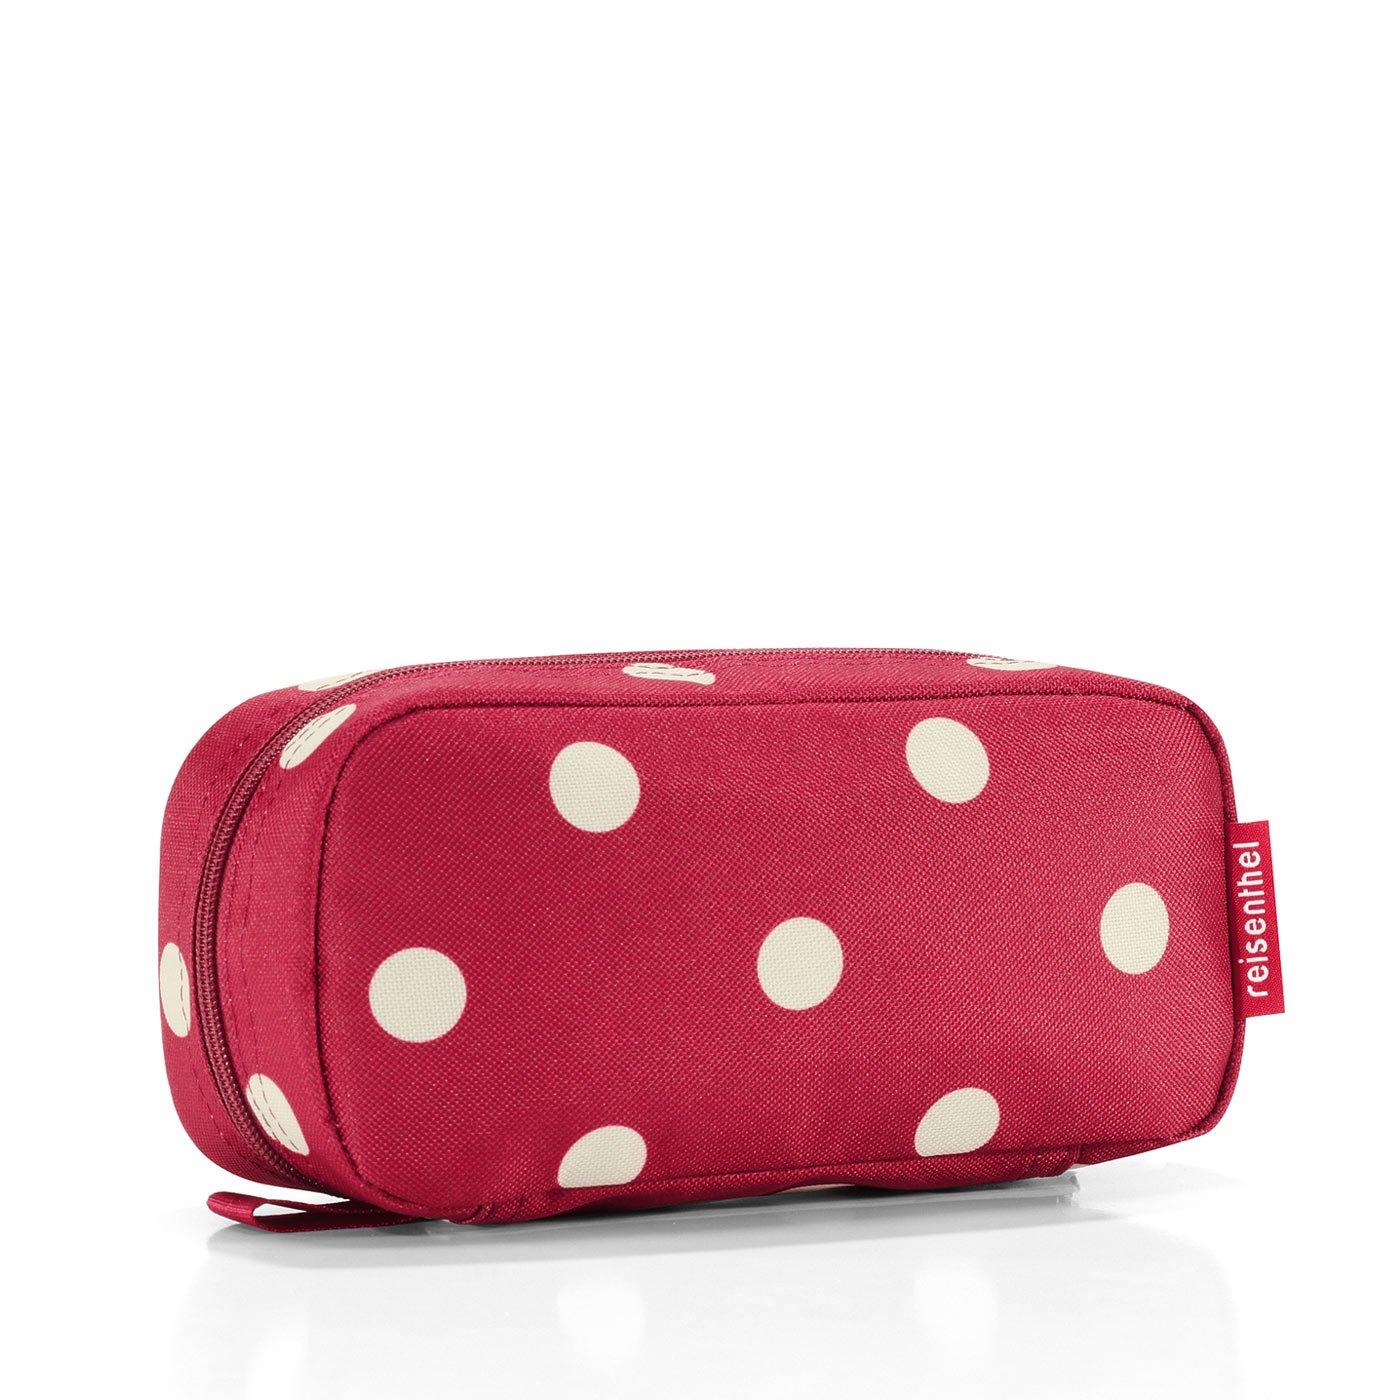 reisenthel multicase ruby dots WJ3014 Kosmetiktasche Federtasche Schminktasche Reisekosmetiktasche